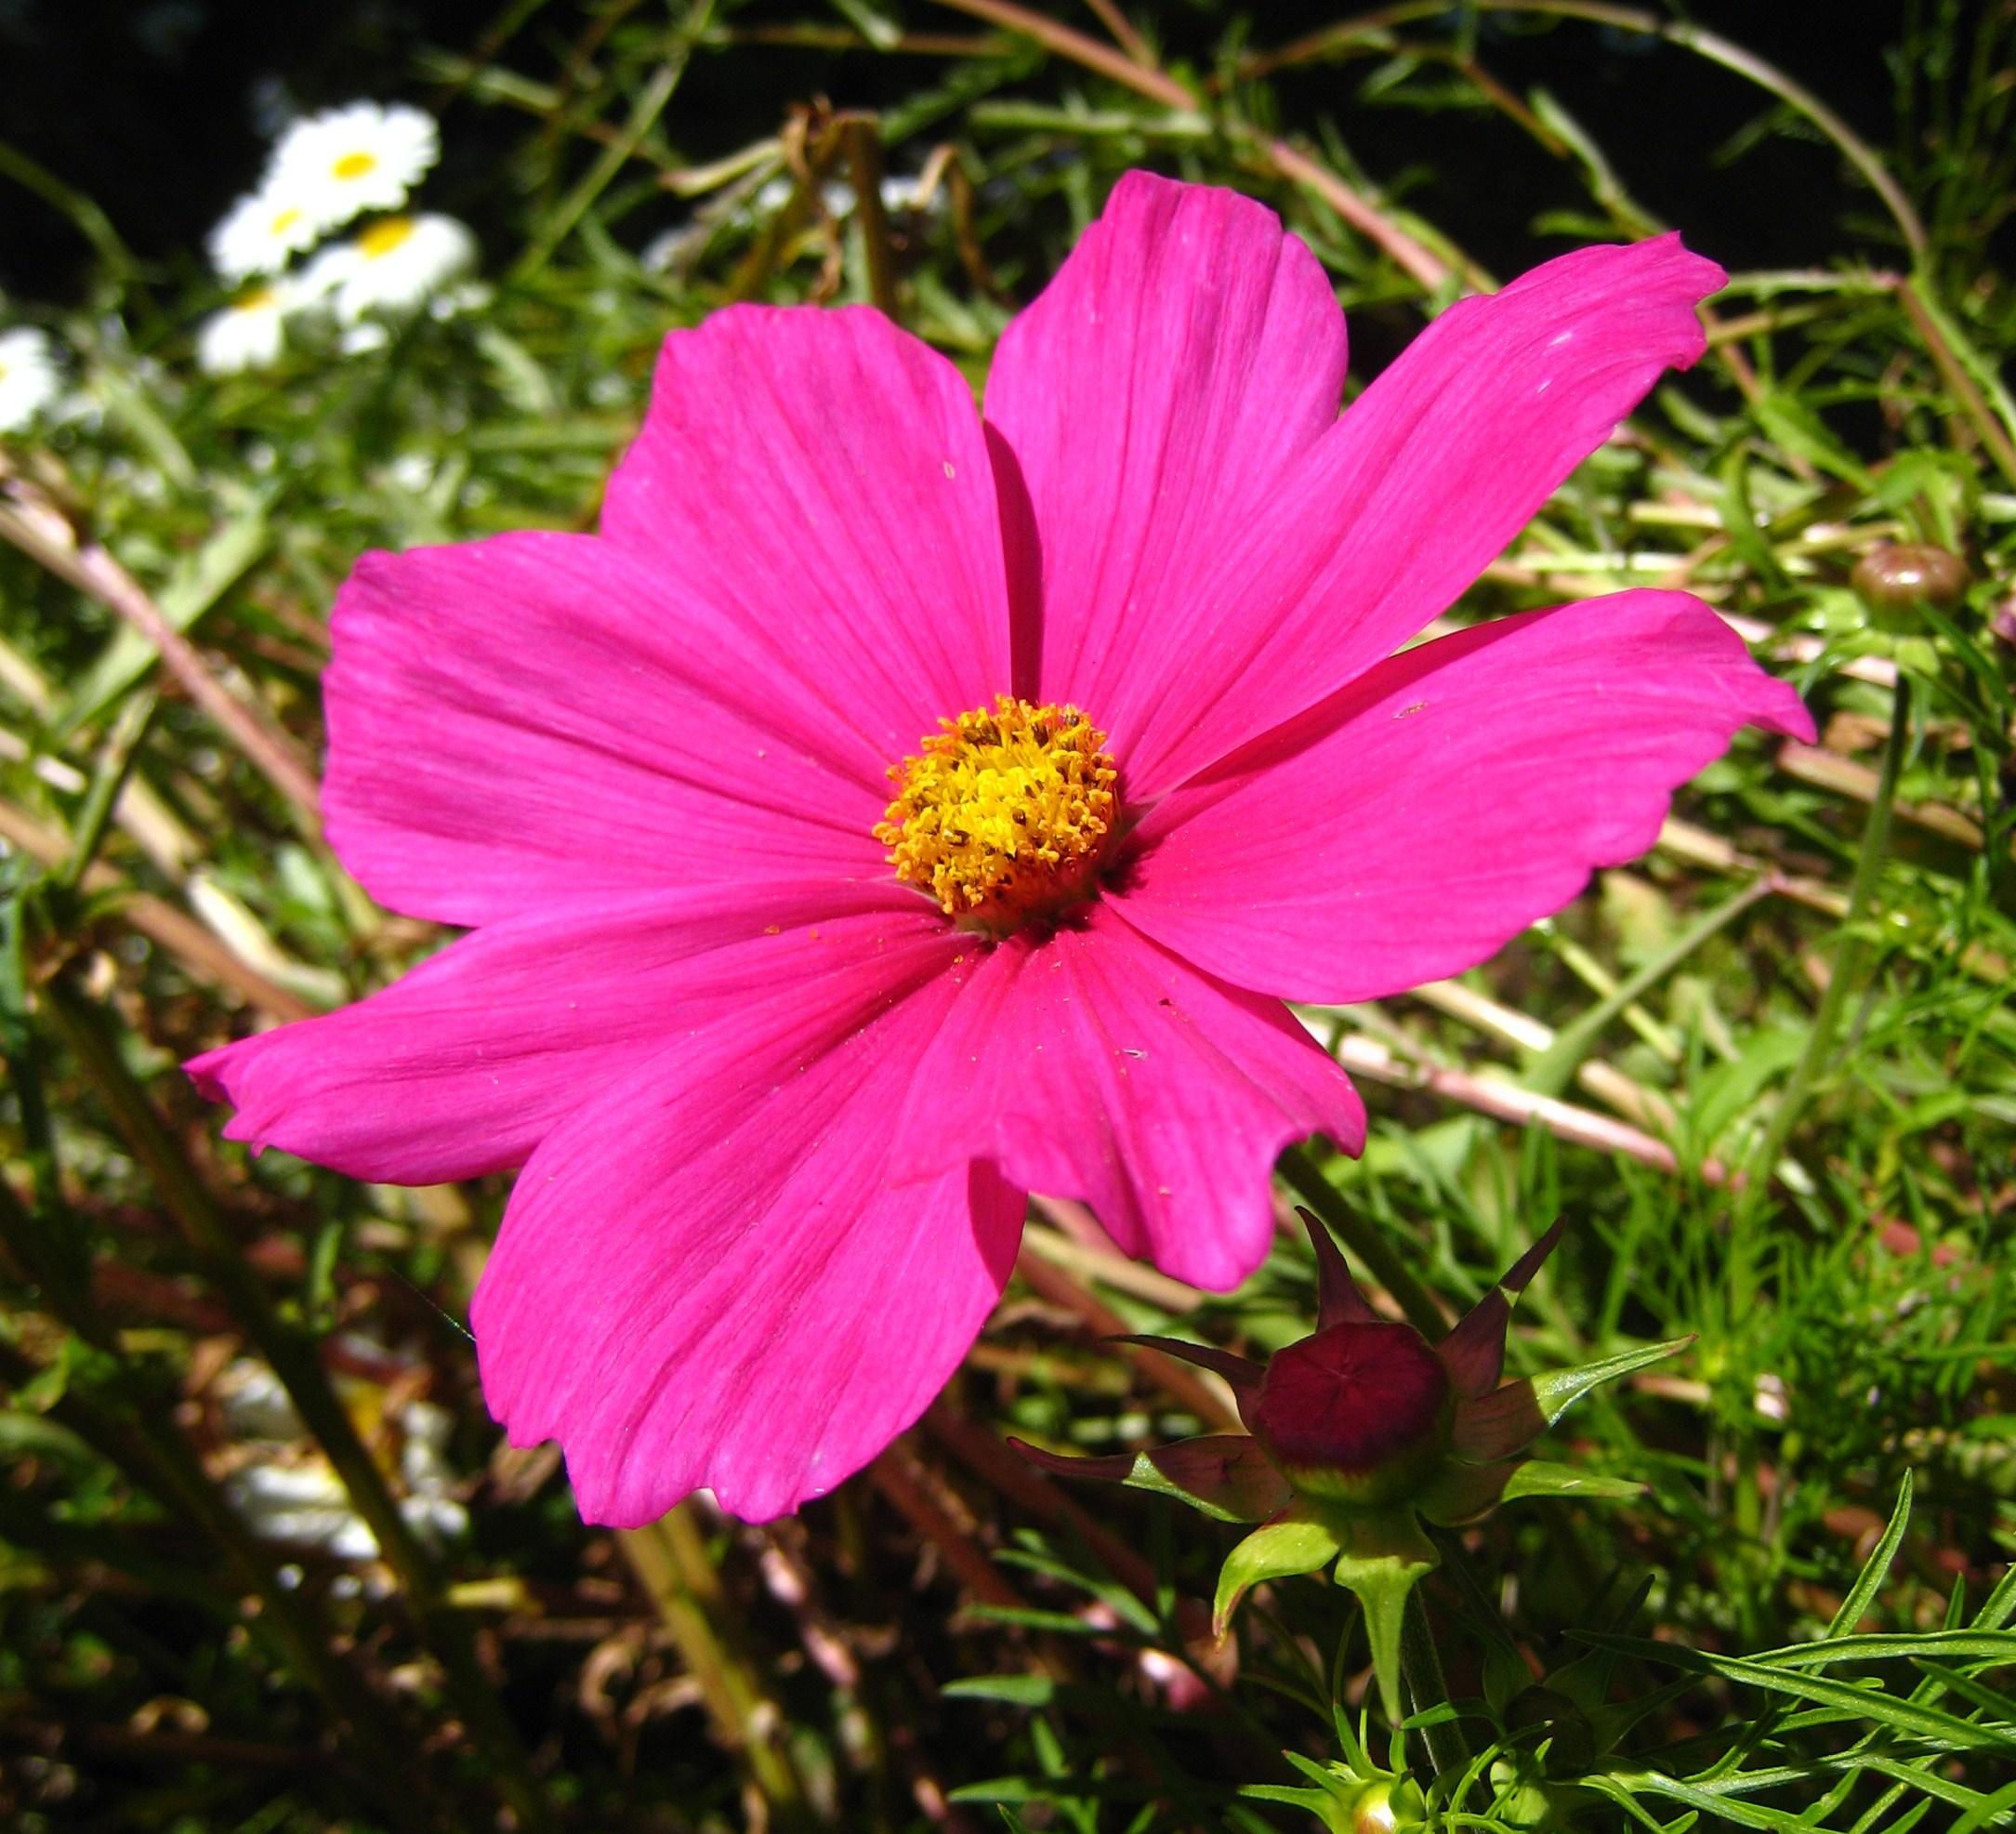 Filepink flower 01 orcasg wikimedia commons filepink flower 01 orcasg mightylinksfo